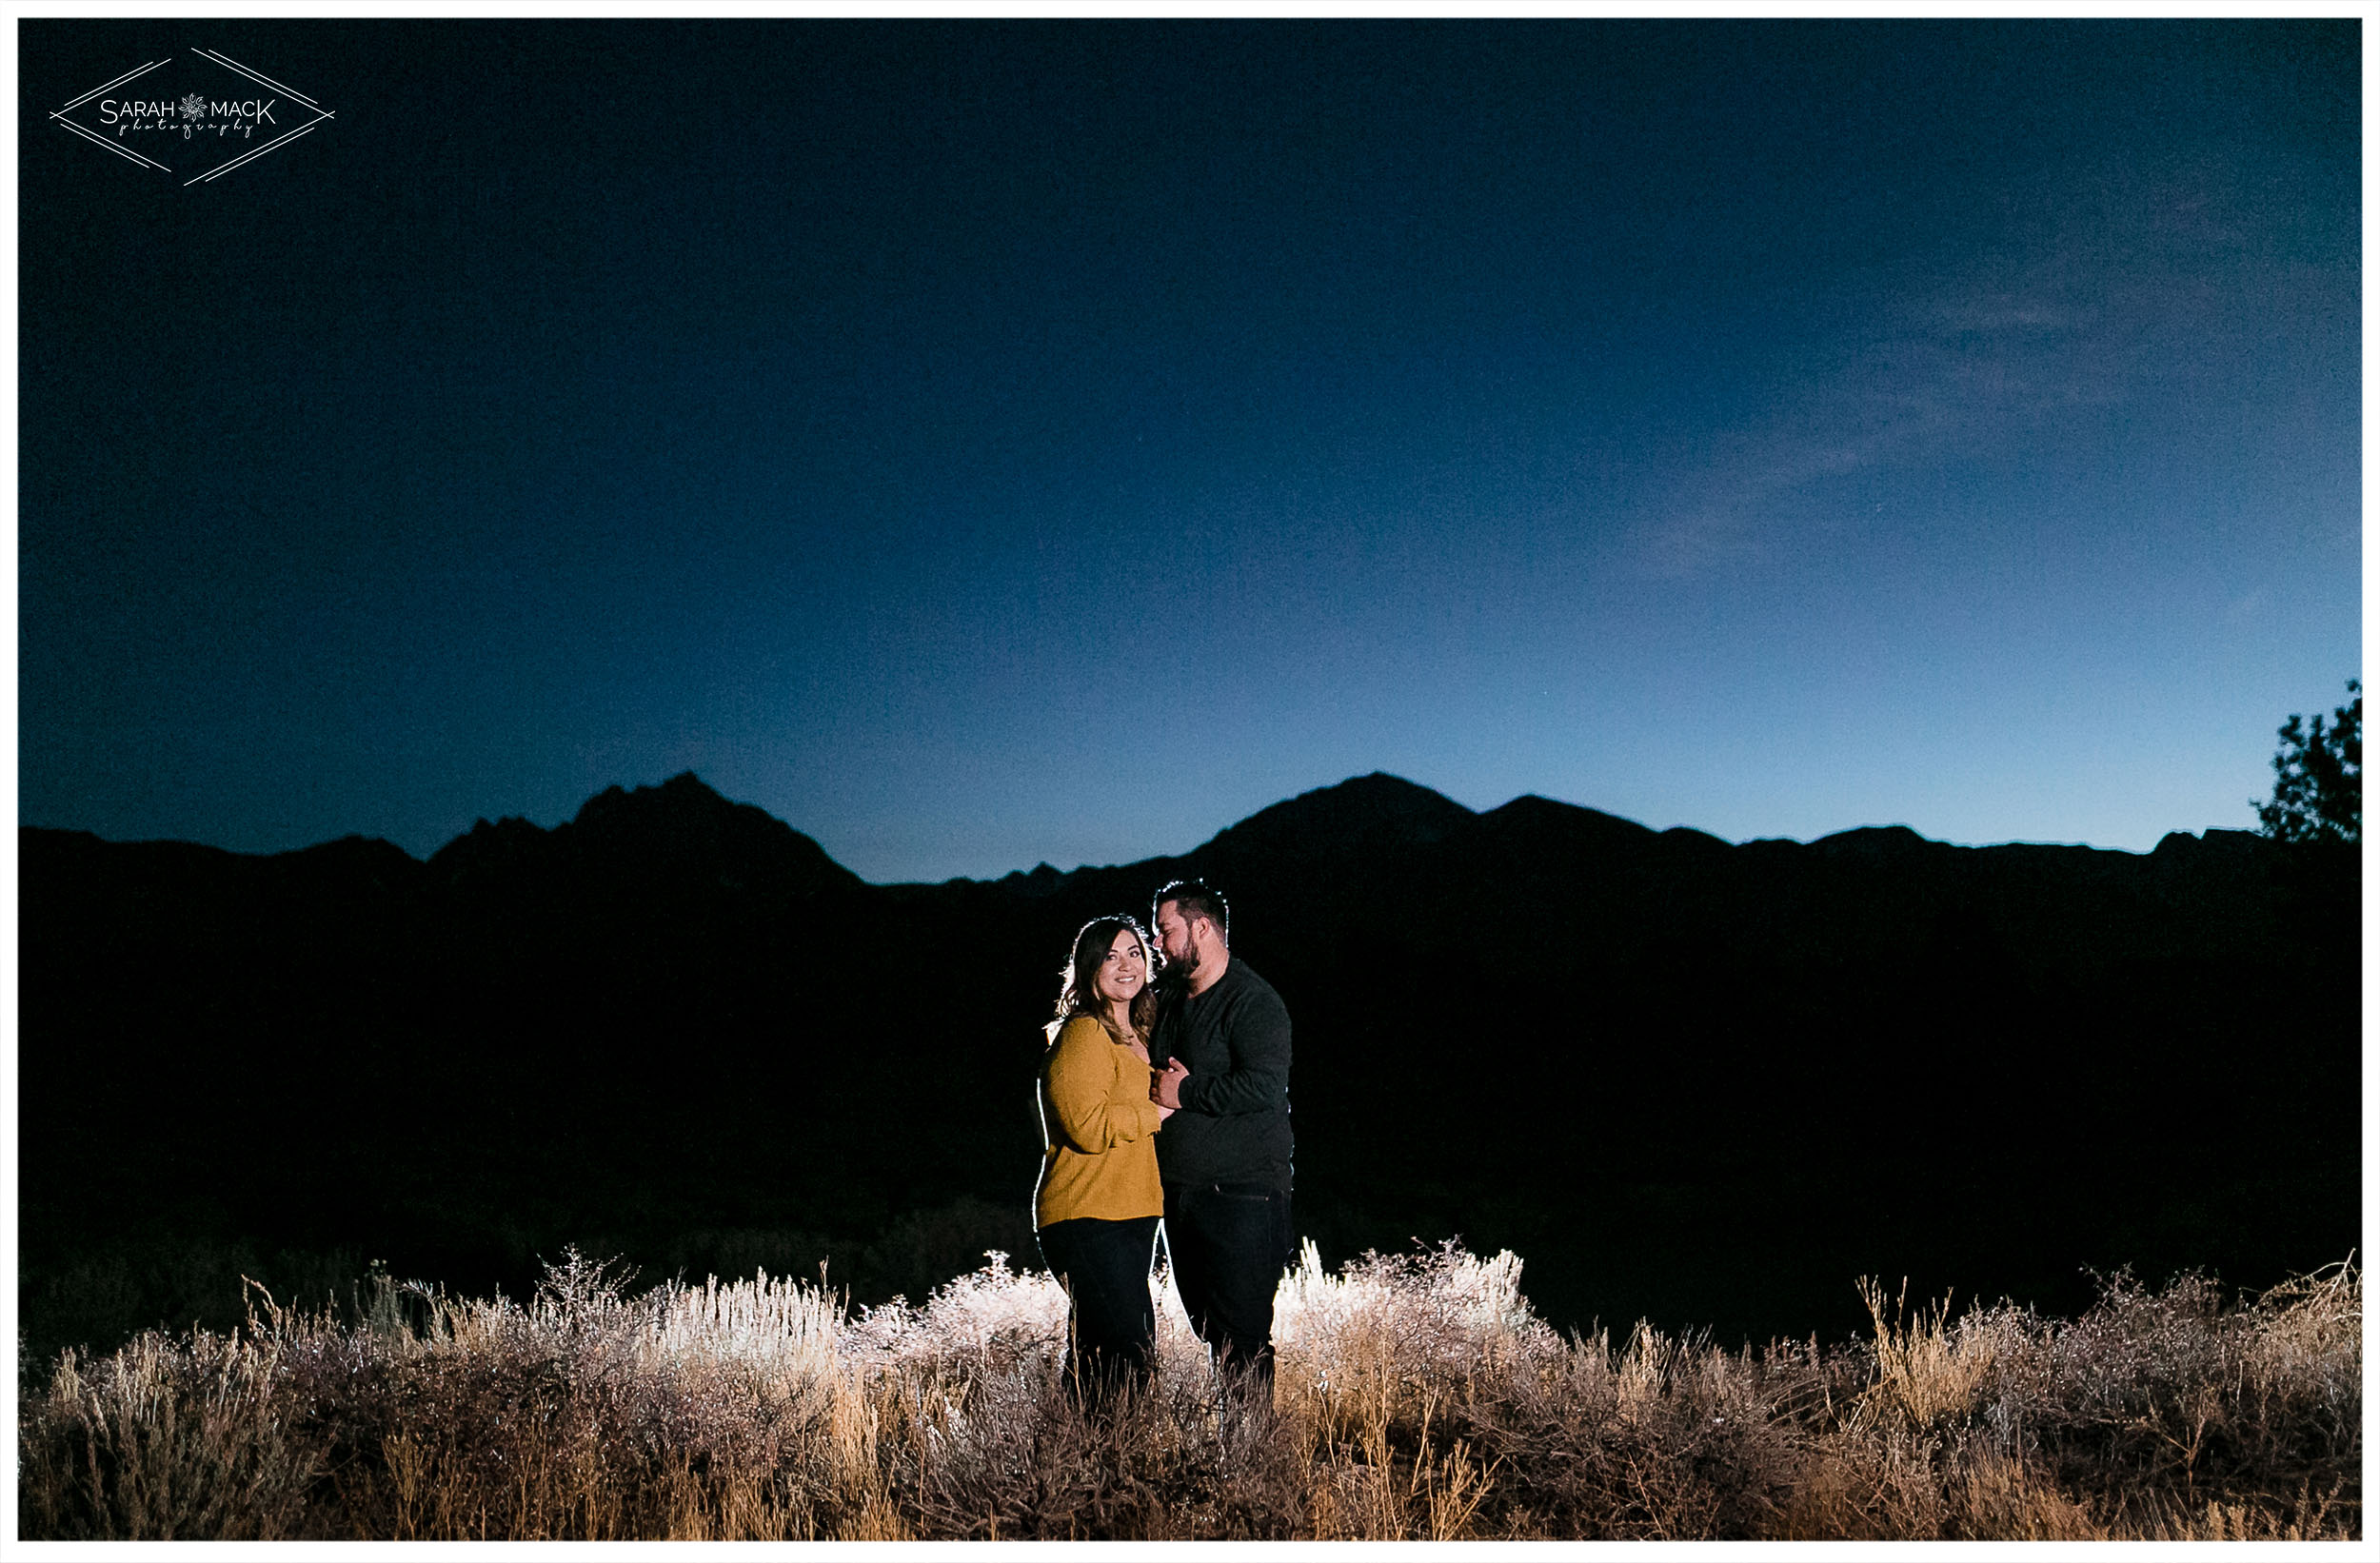 Hot Creek Mammoth Engagement Photography, Mountain Top Engagement, Fall Engagement Photography, Outdoor Engagement Session, Los Angeles Photographer, Orange County Photographer